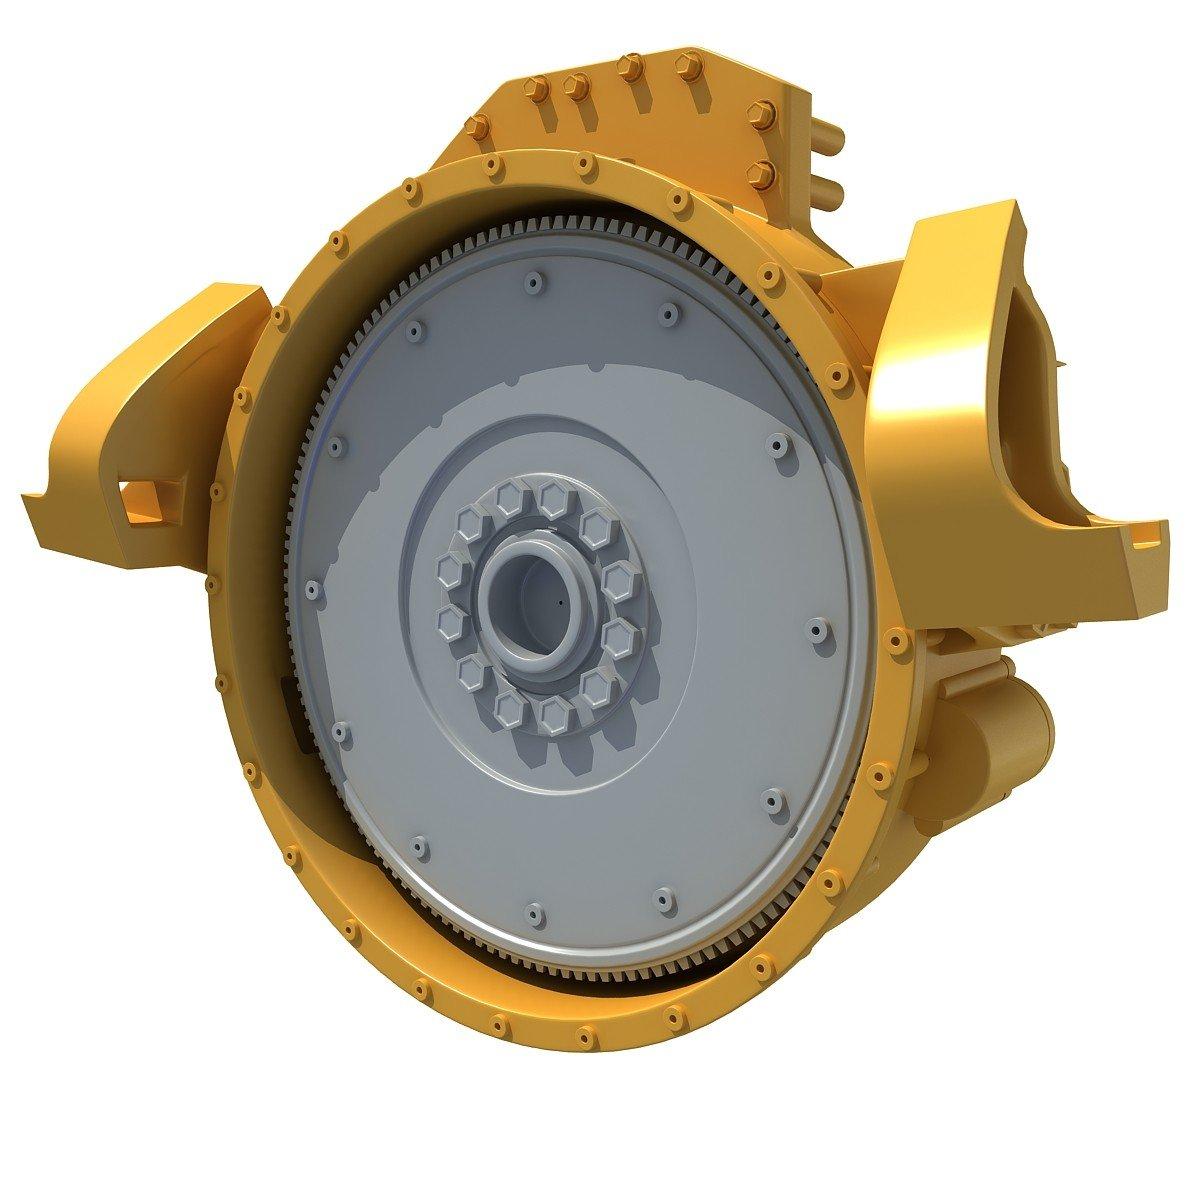 3D Engine Parts  #3D #3dEngine #3dParts http://bit.ly/2AV2zgBpic.twitter.com/H5CWipsRNV